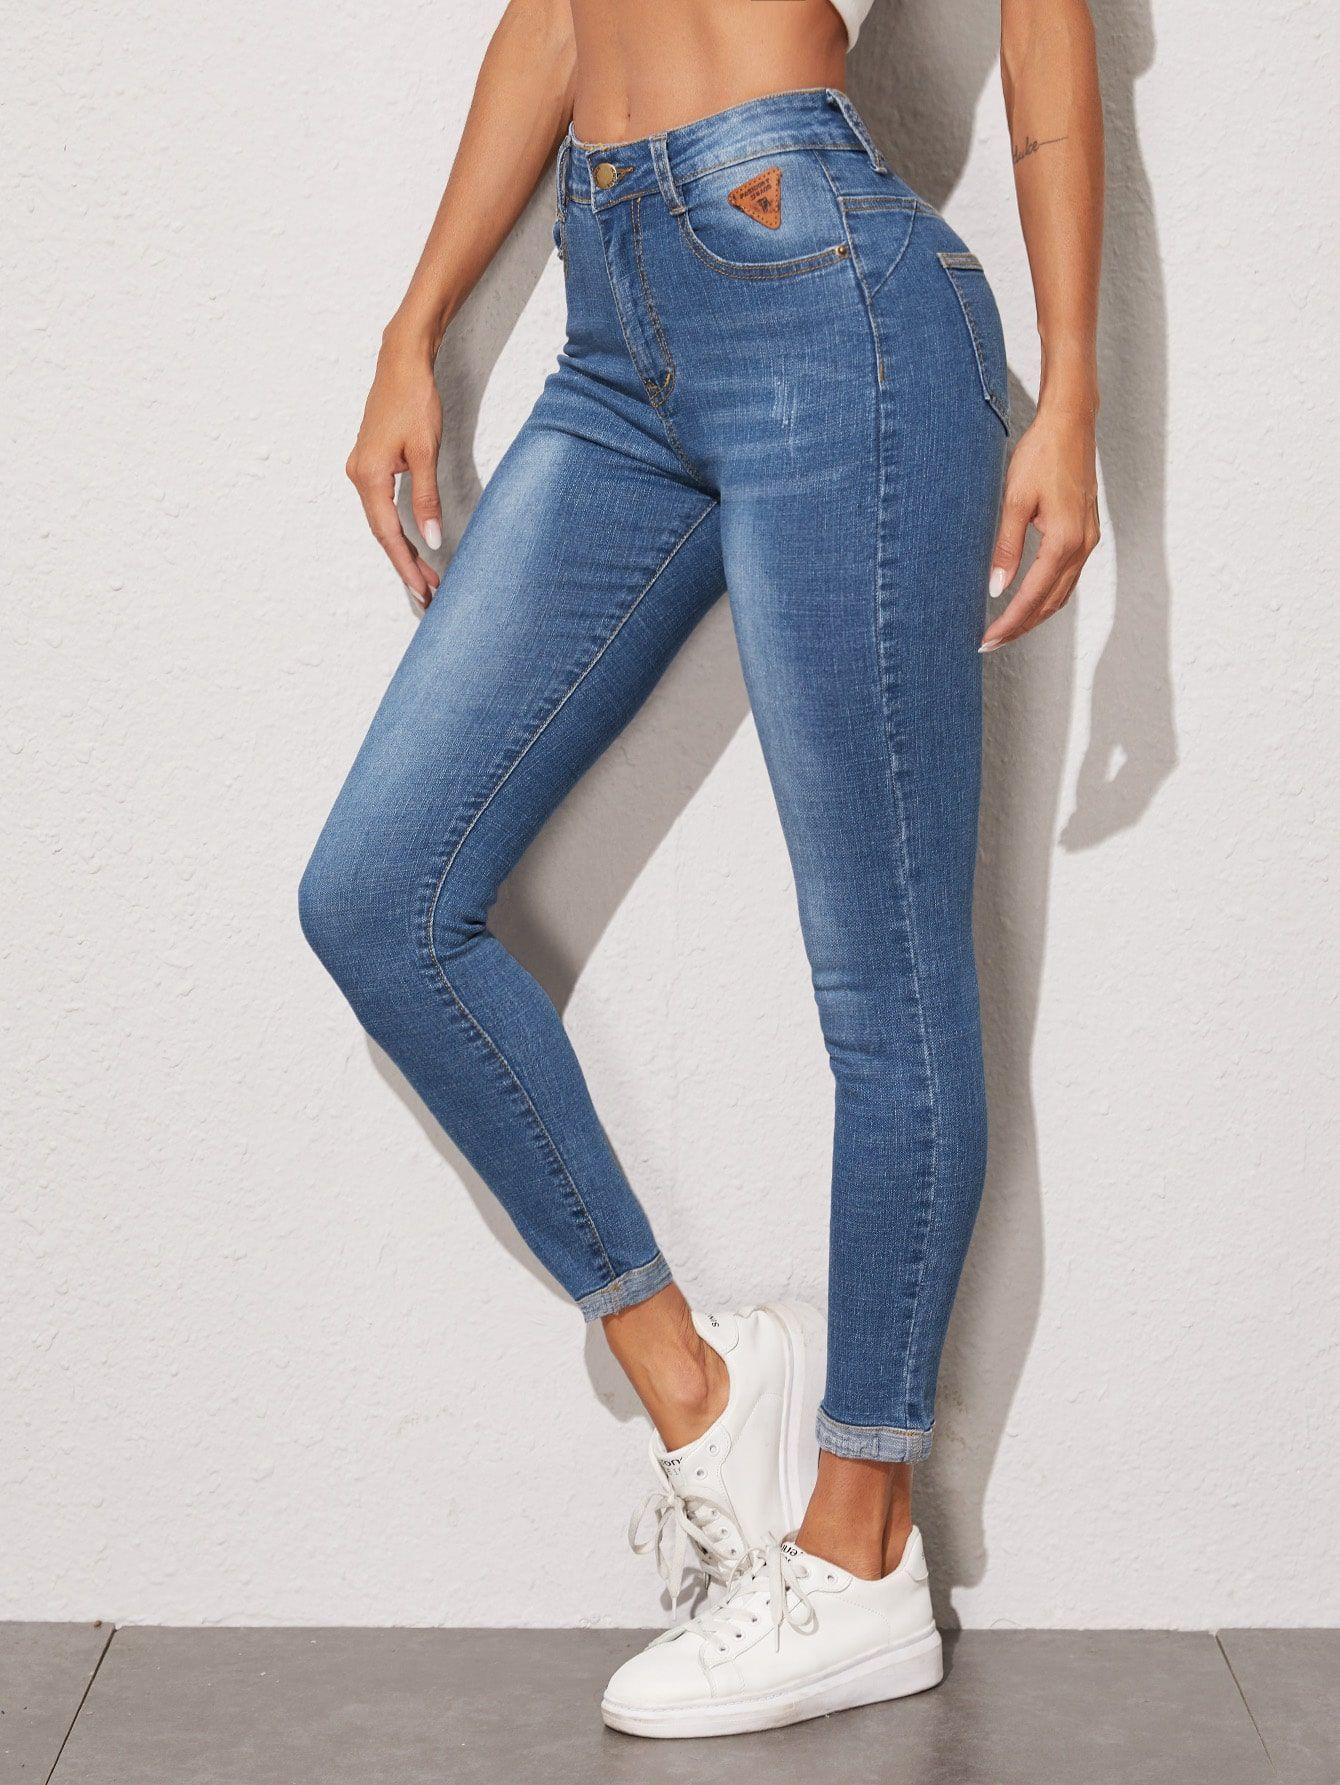 Roll Hem Patched Detail Skinny Jeans Romwe Vaqueros Pitillo Pantalones Vaqueros Rotos Atuendos De Moda Para Mujer